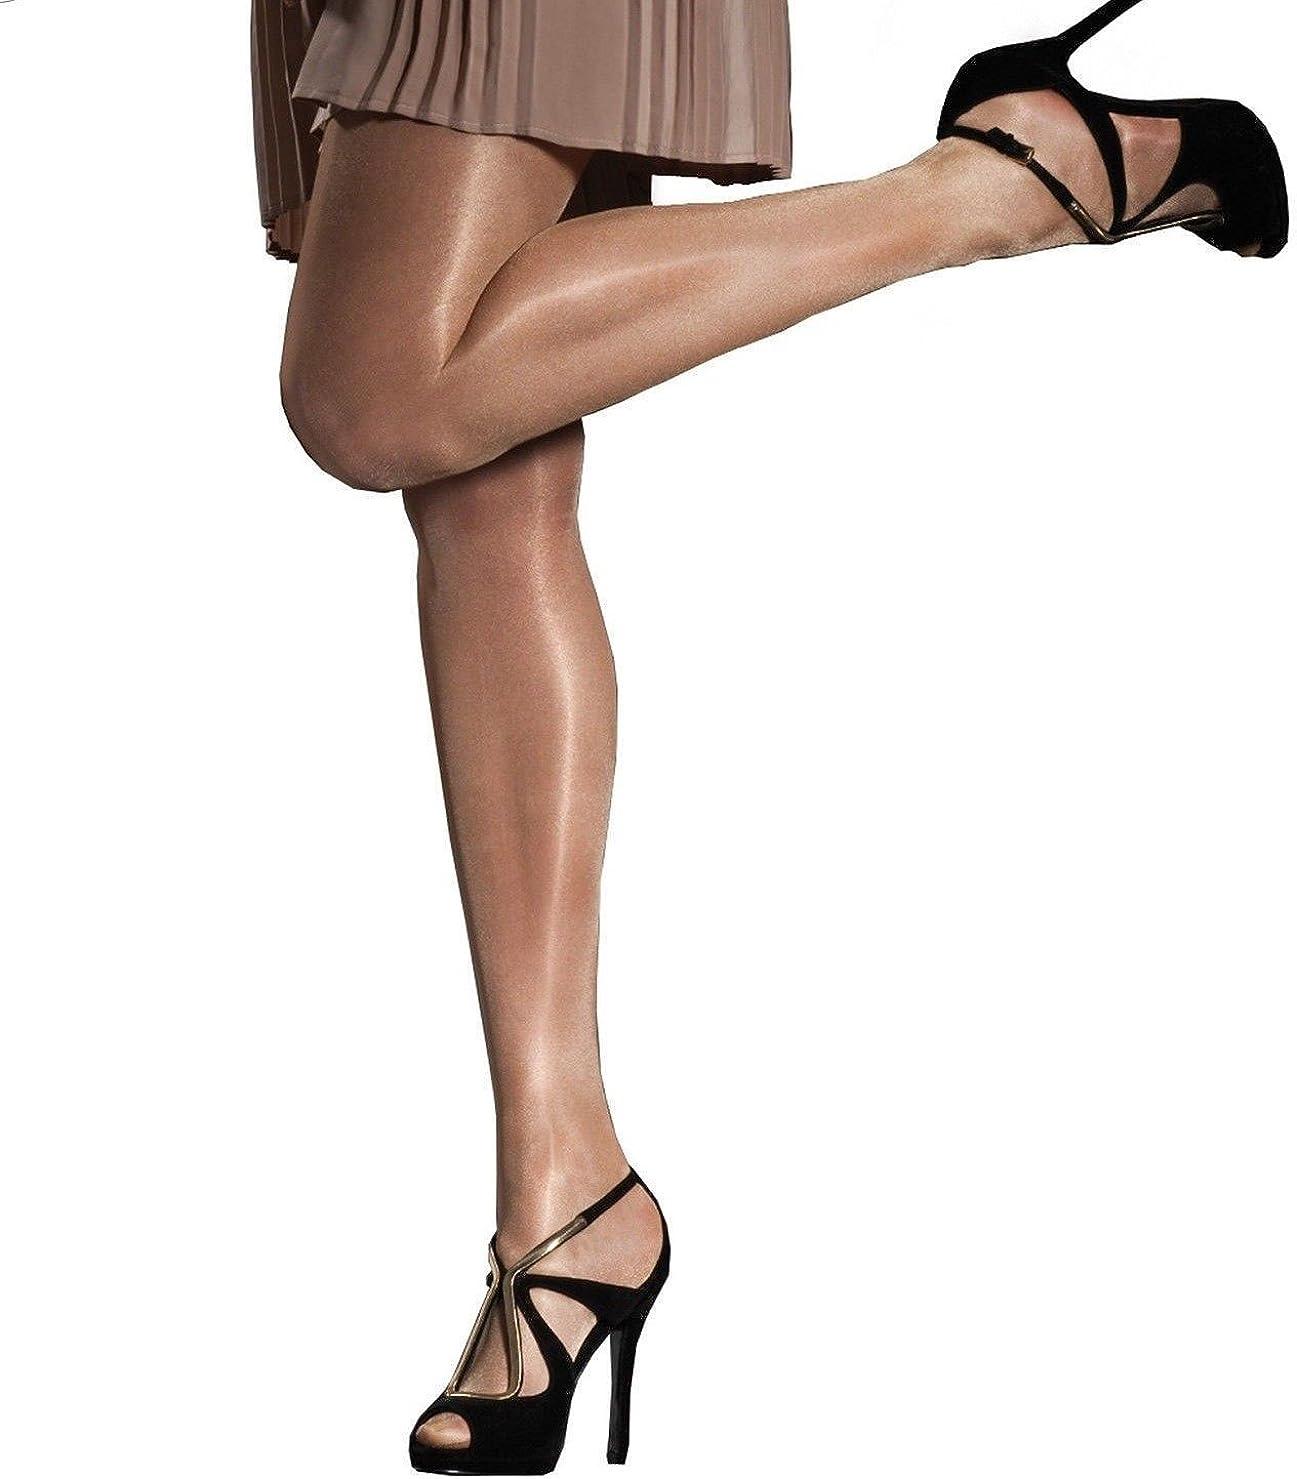 Fiore Women's Elite Idalia Gloss Pantyhose medium (5'4